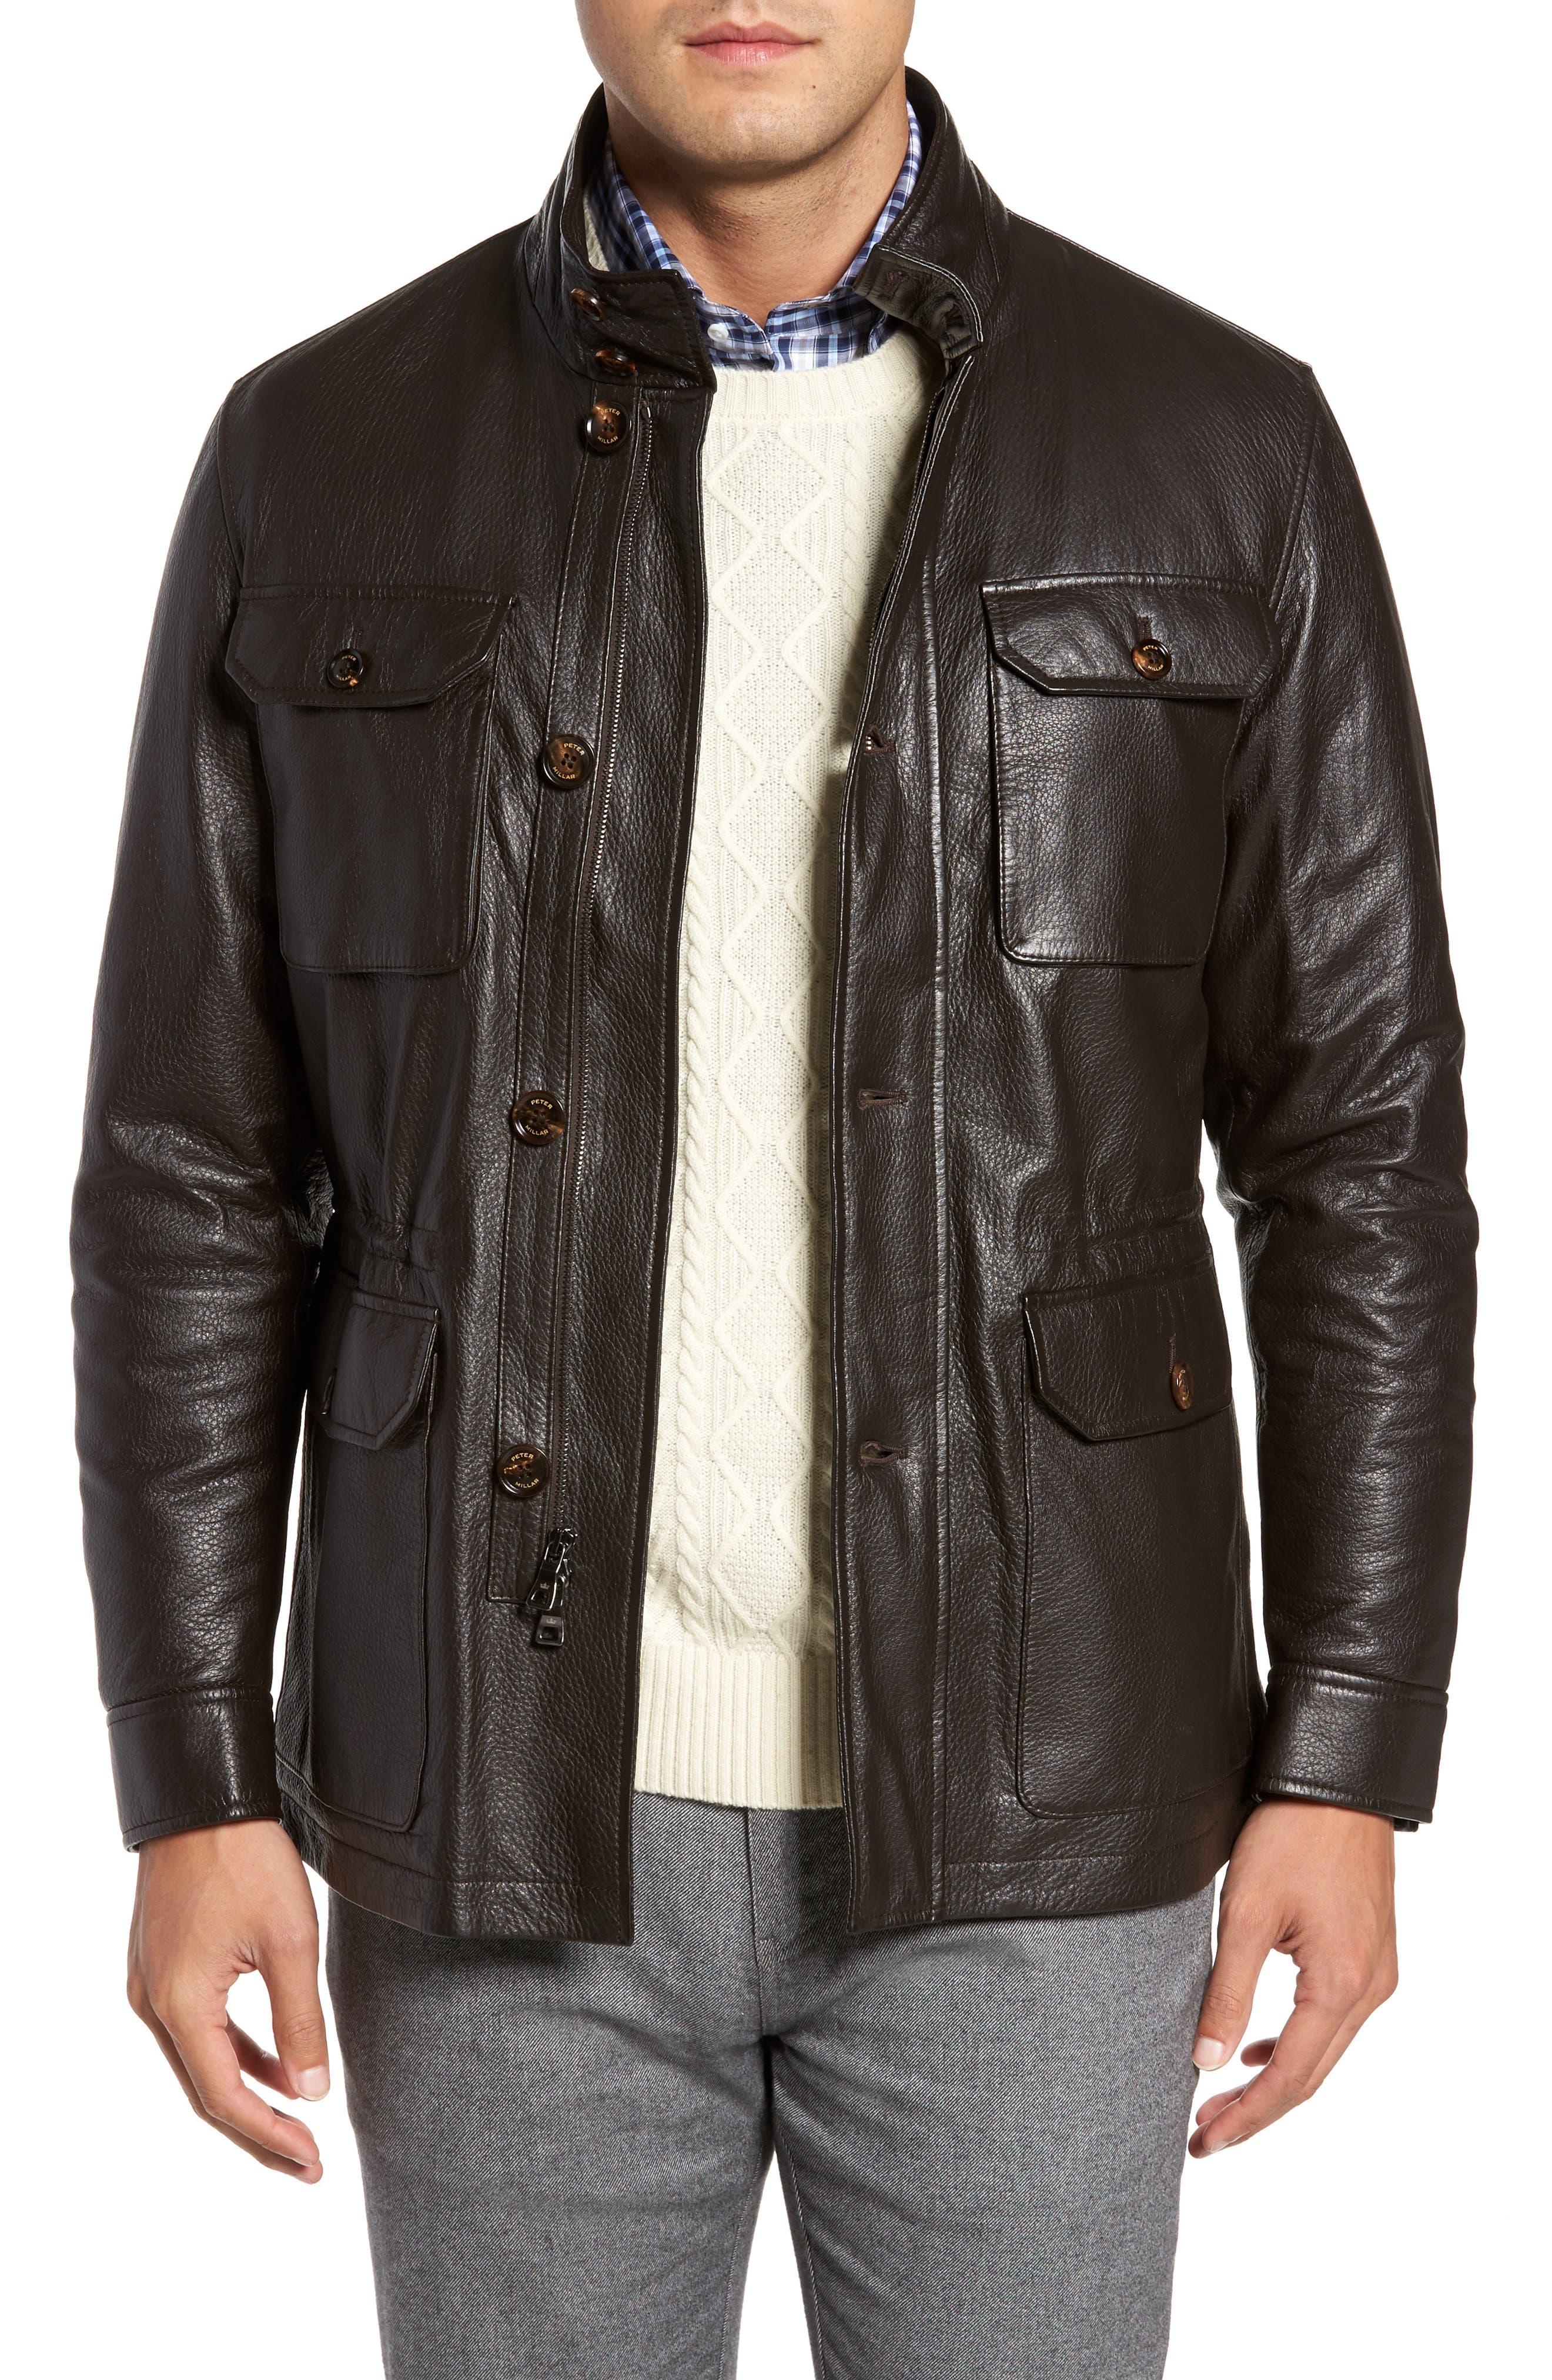 Peter Millar Woodland Discovery Deerskin Leather Jacket